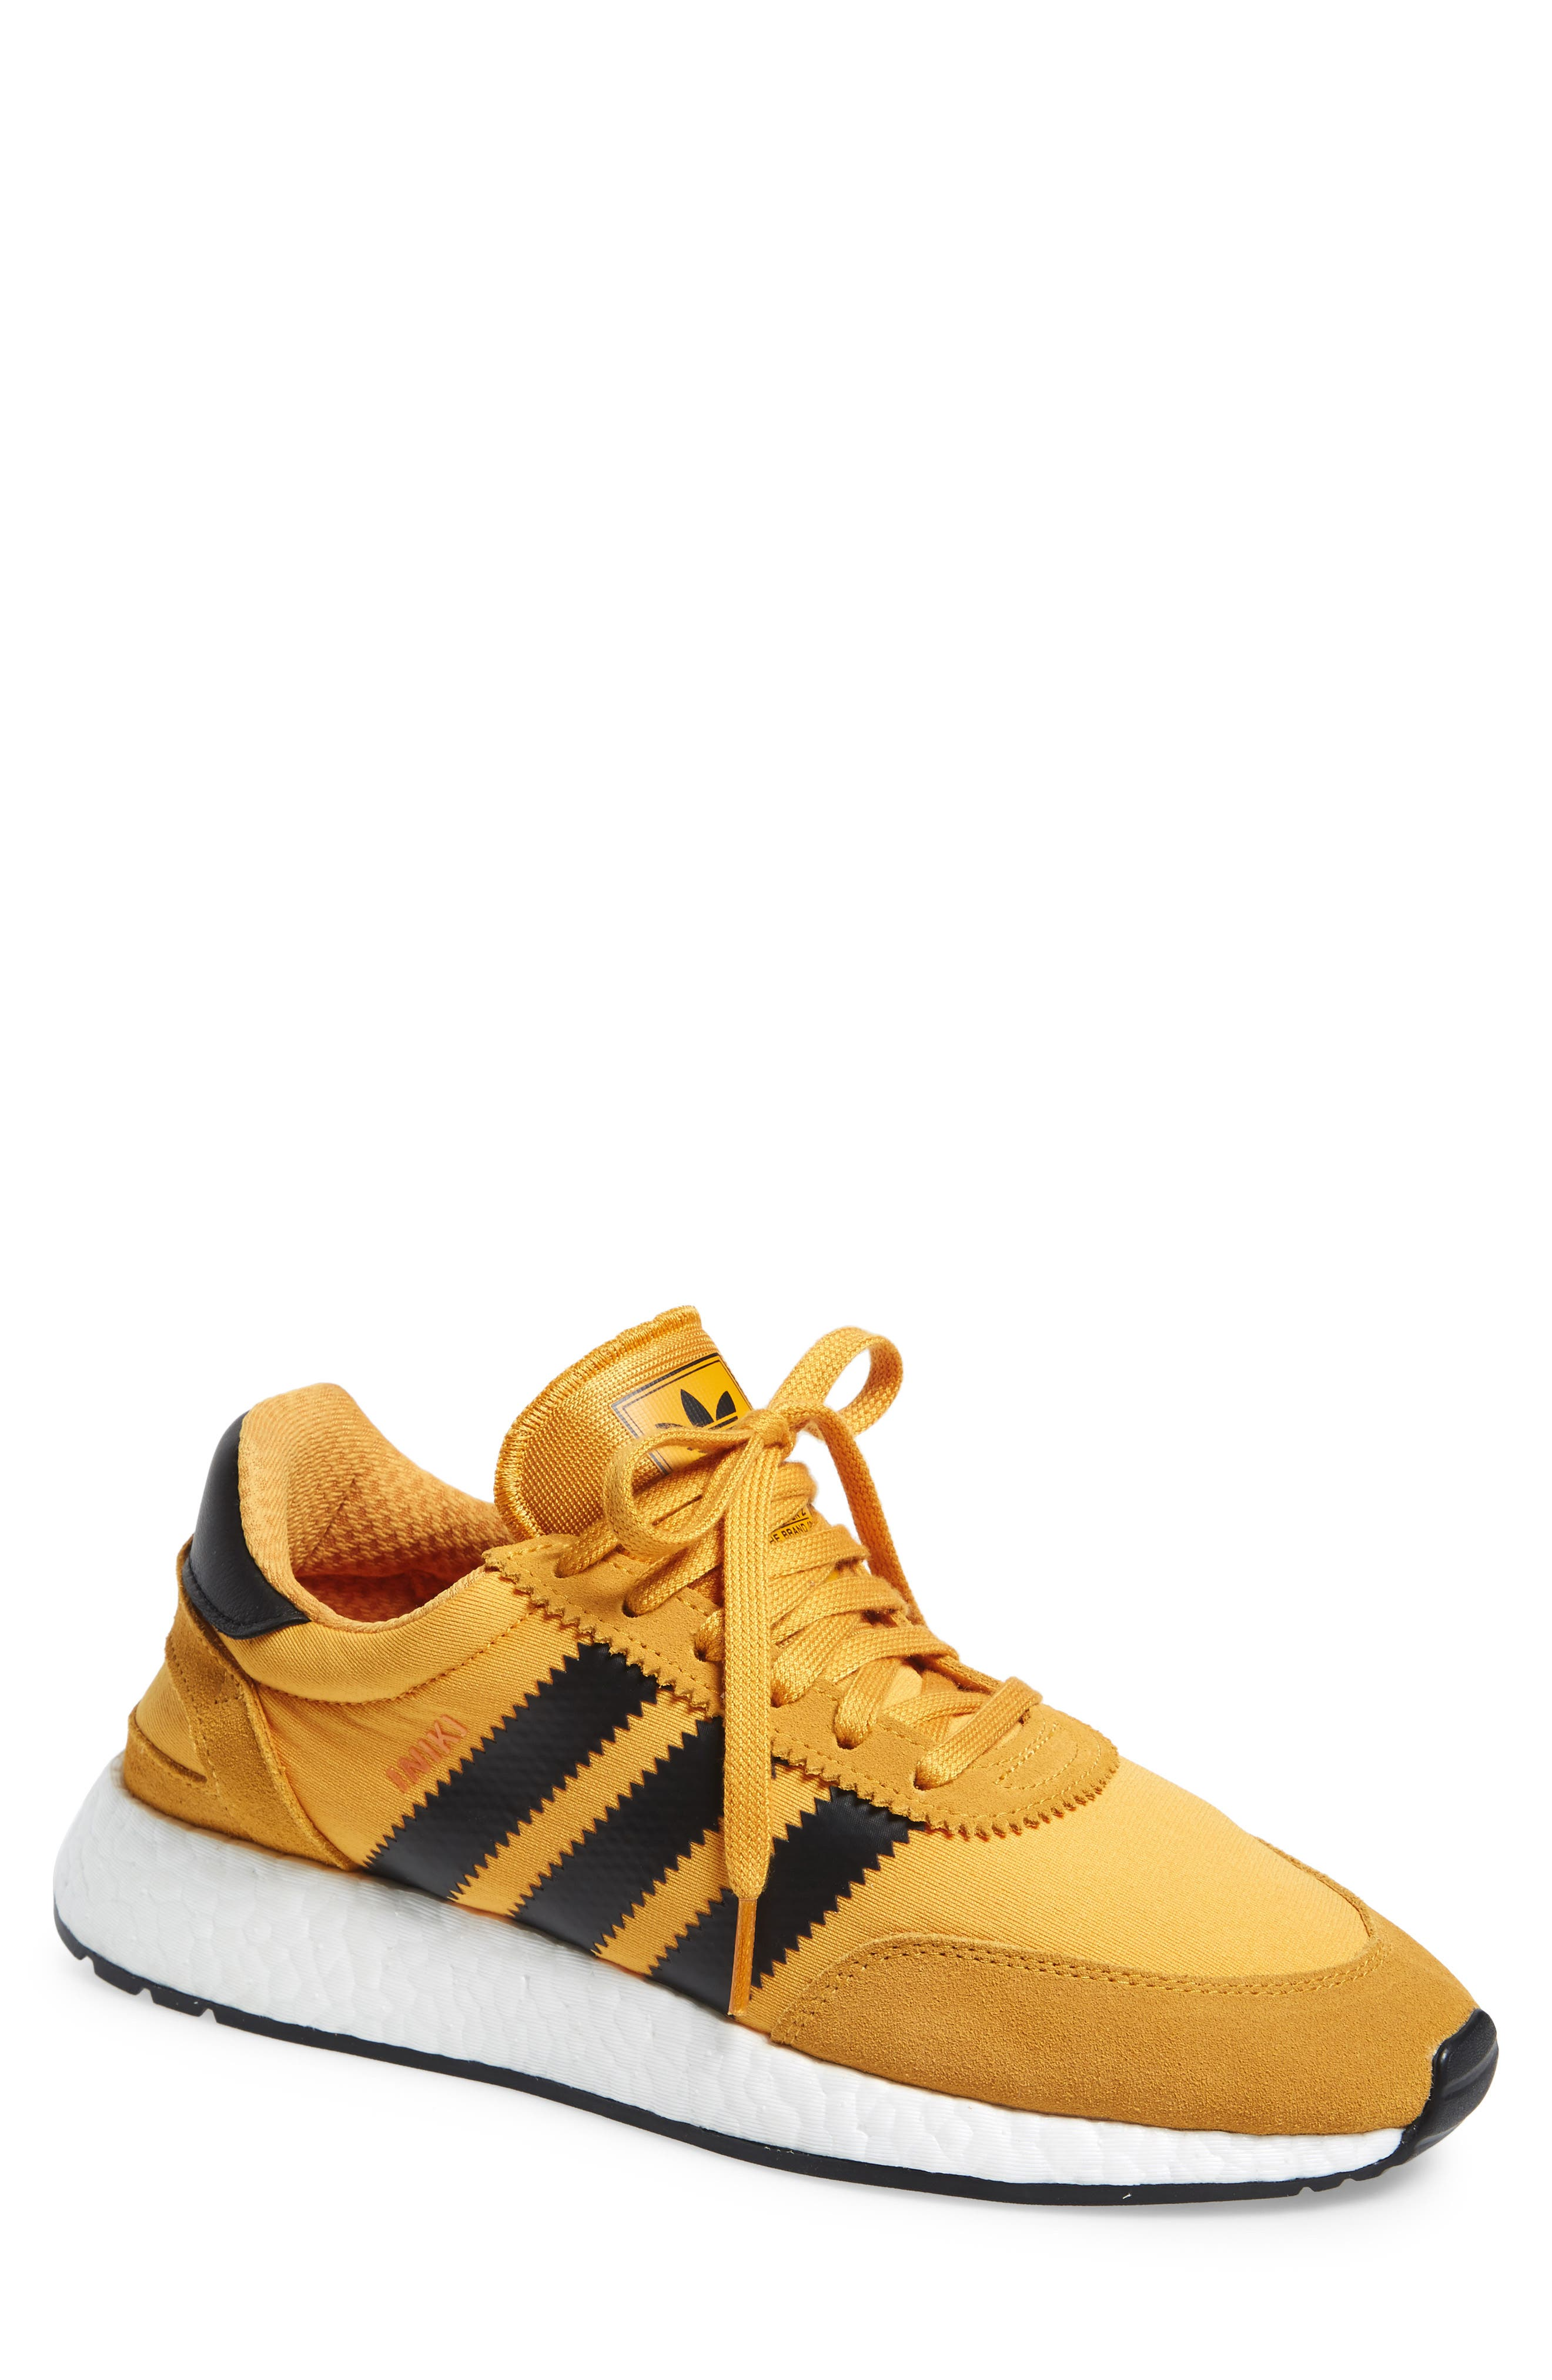 I-5923 Sneaker,                         Main,                         color, Tactile Yellow/ Black/ White